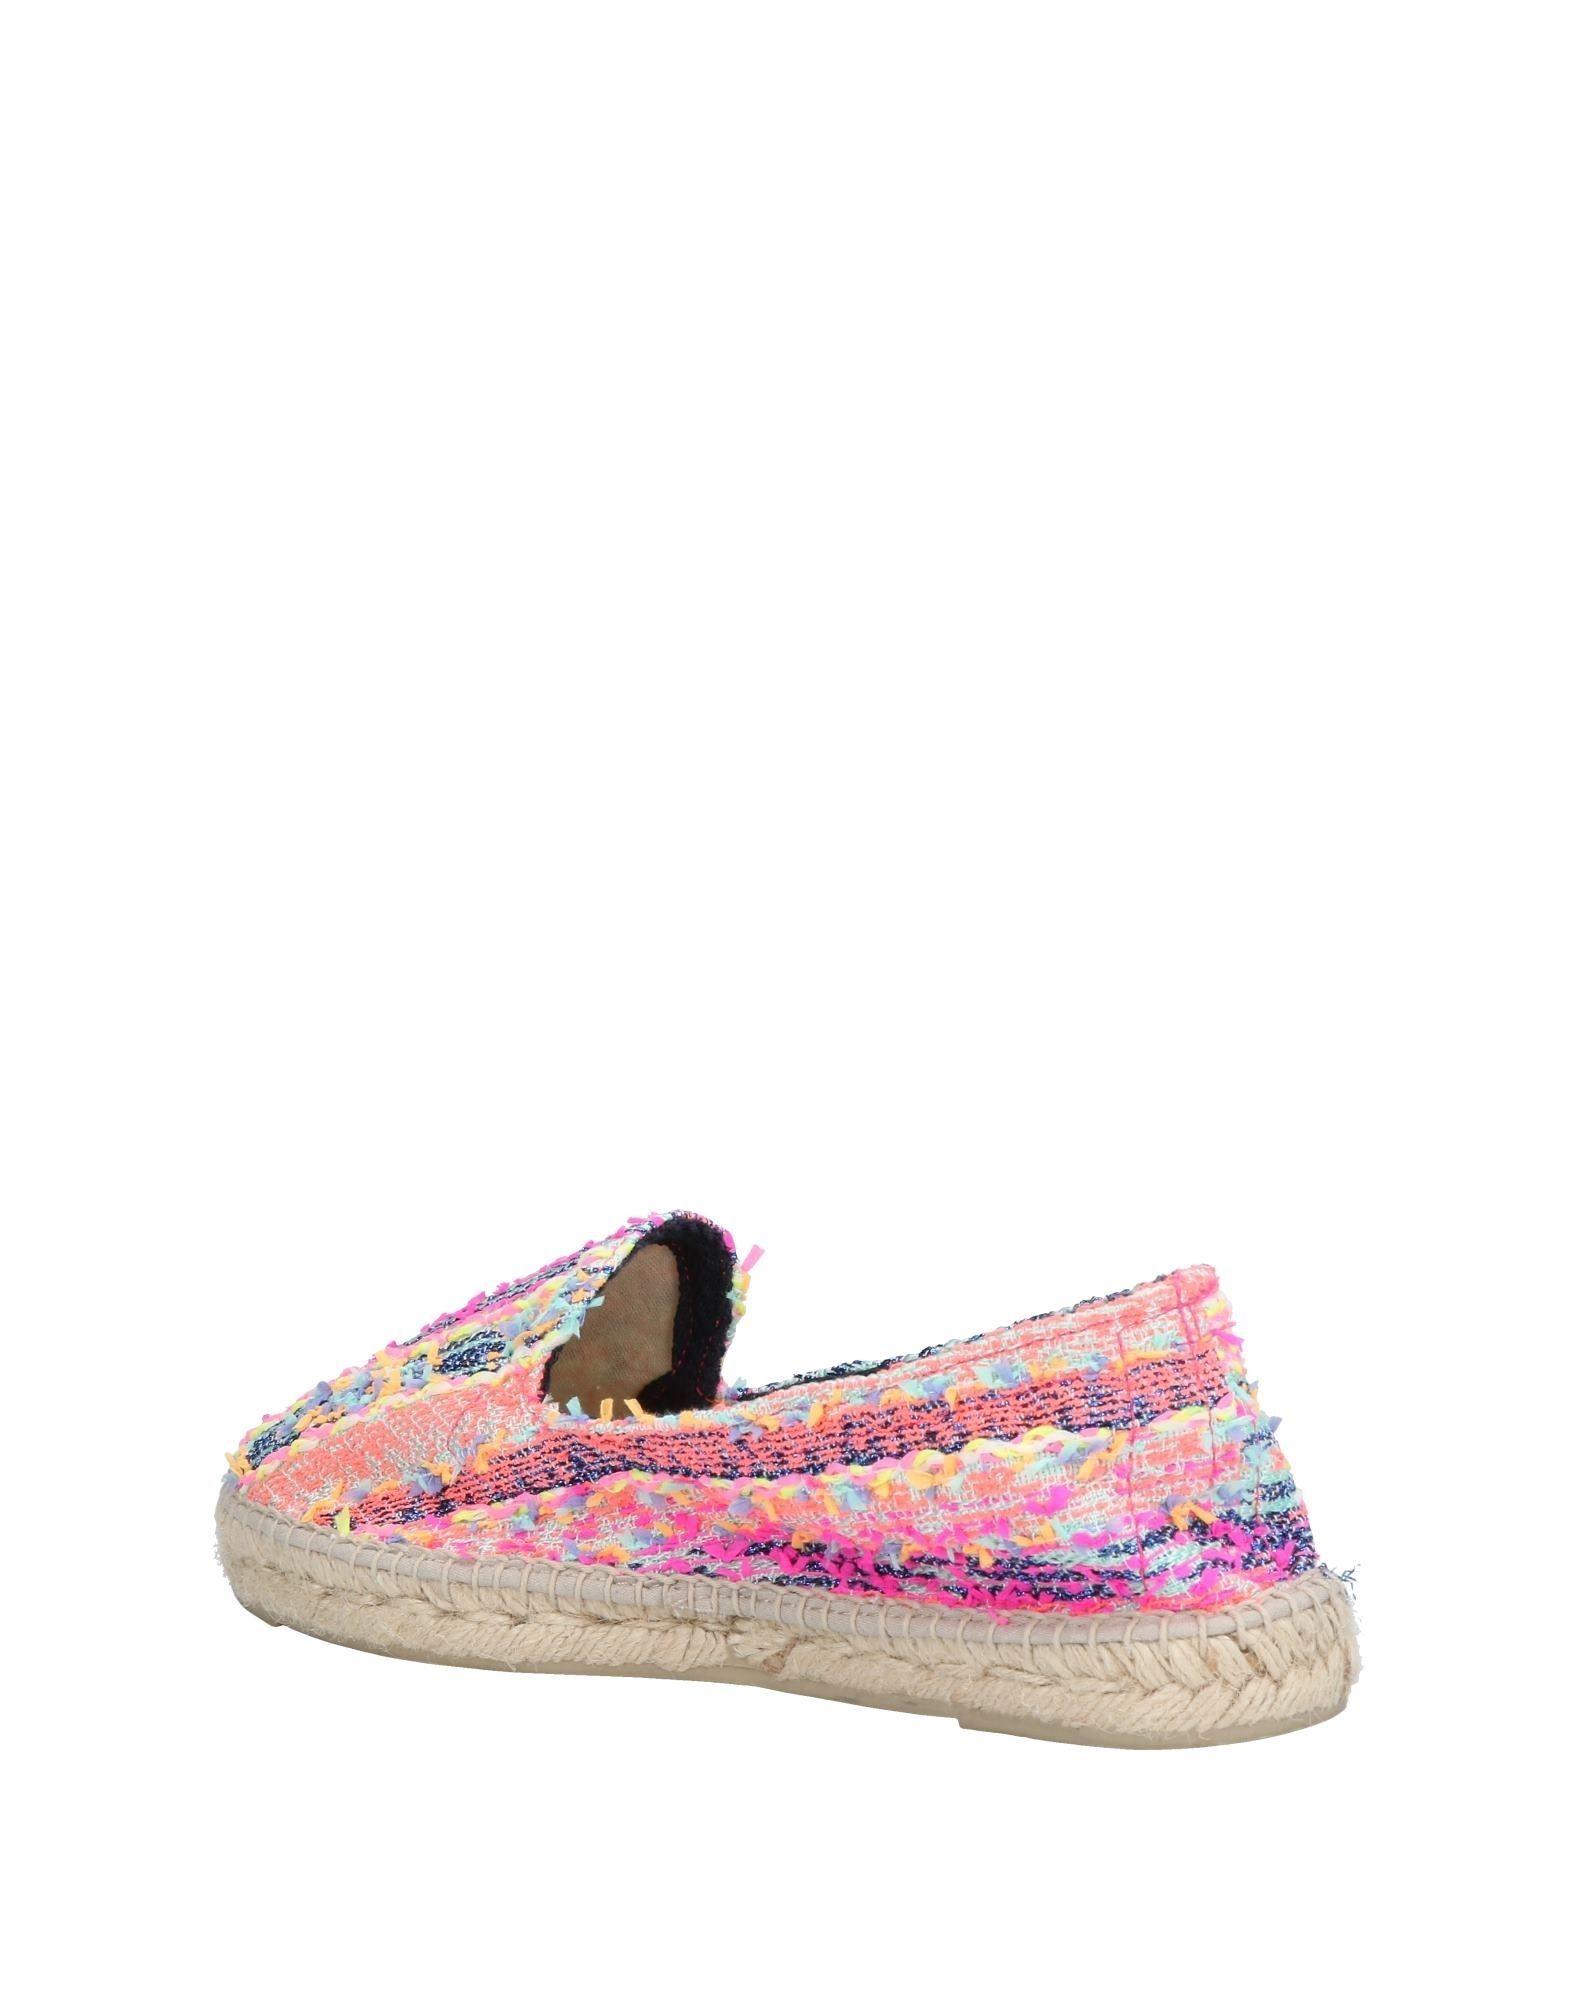 Manebí Espadrilles Espadrilles Manebí Damen  11438697EE Gute Qualität beliebte Schuhe 1f2103